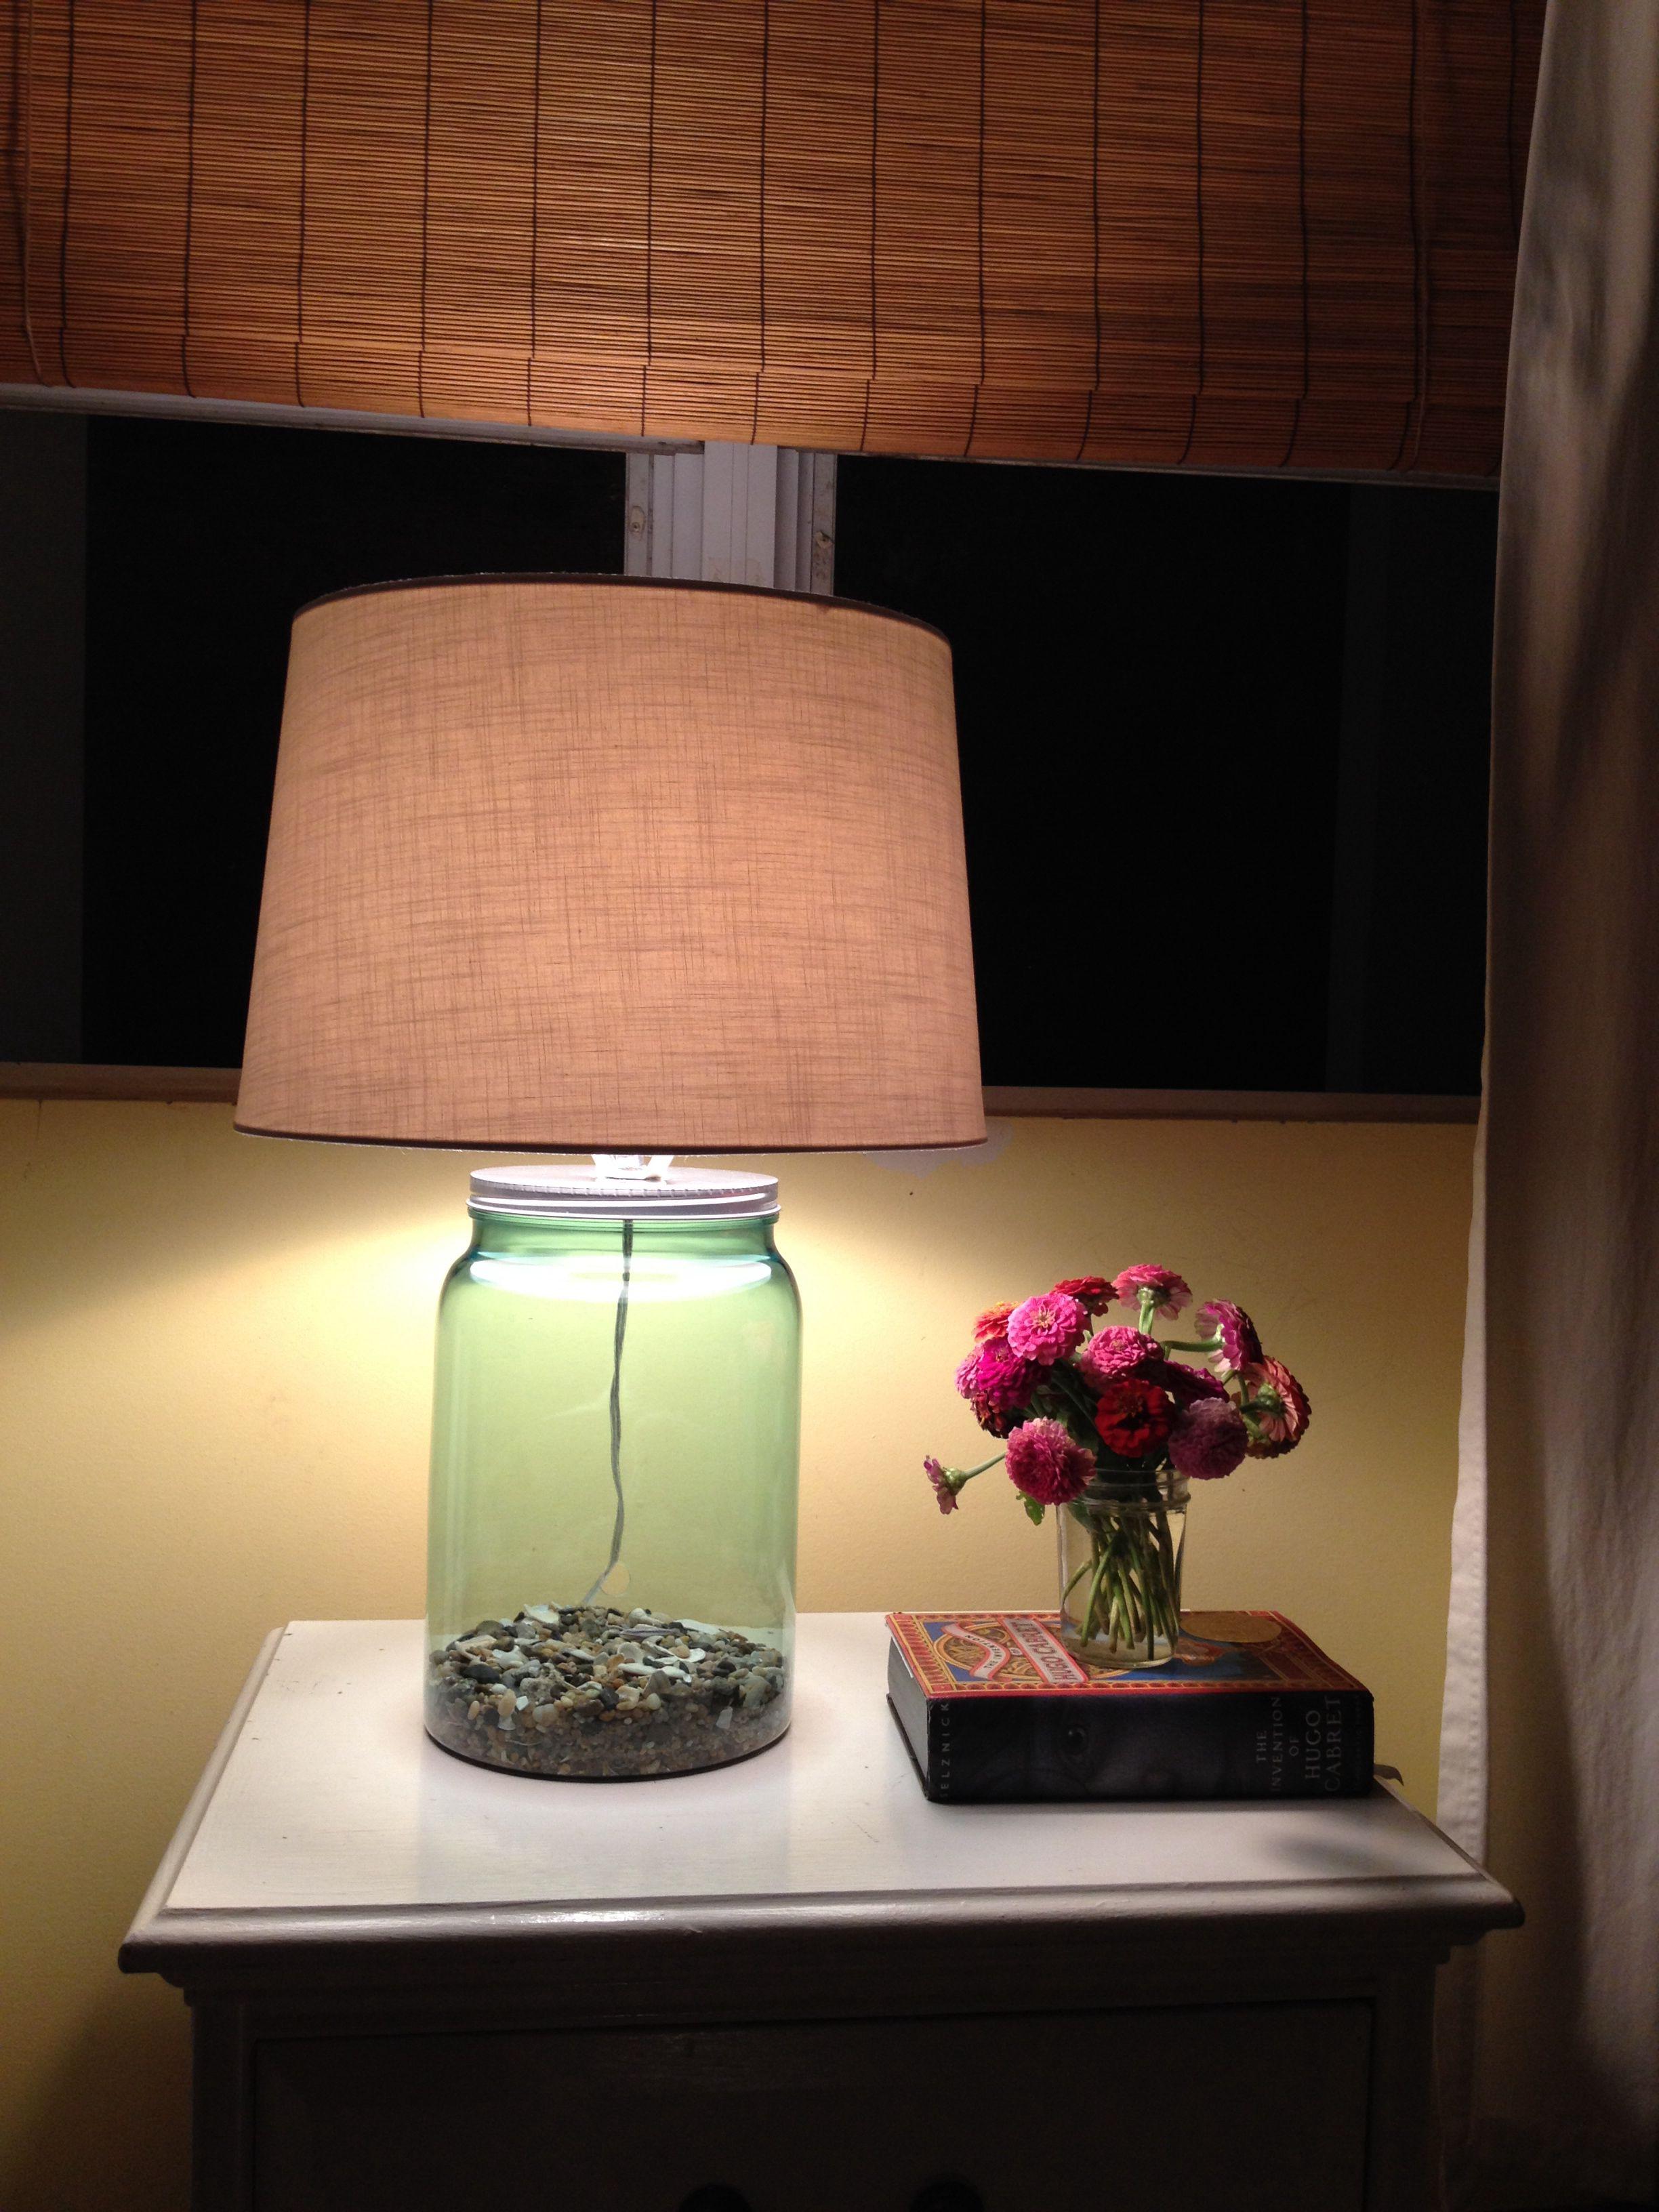 DIY clear blue lamp. Base is a clear blue kid friendly